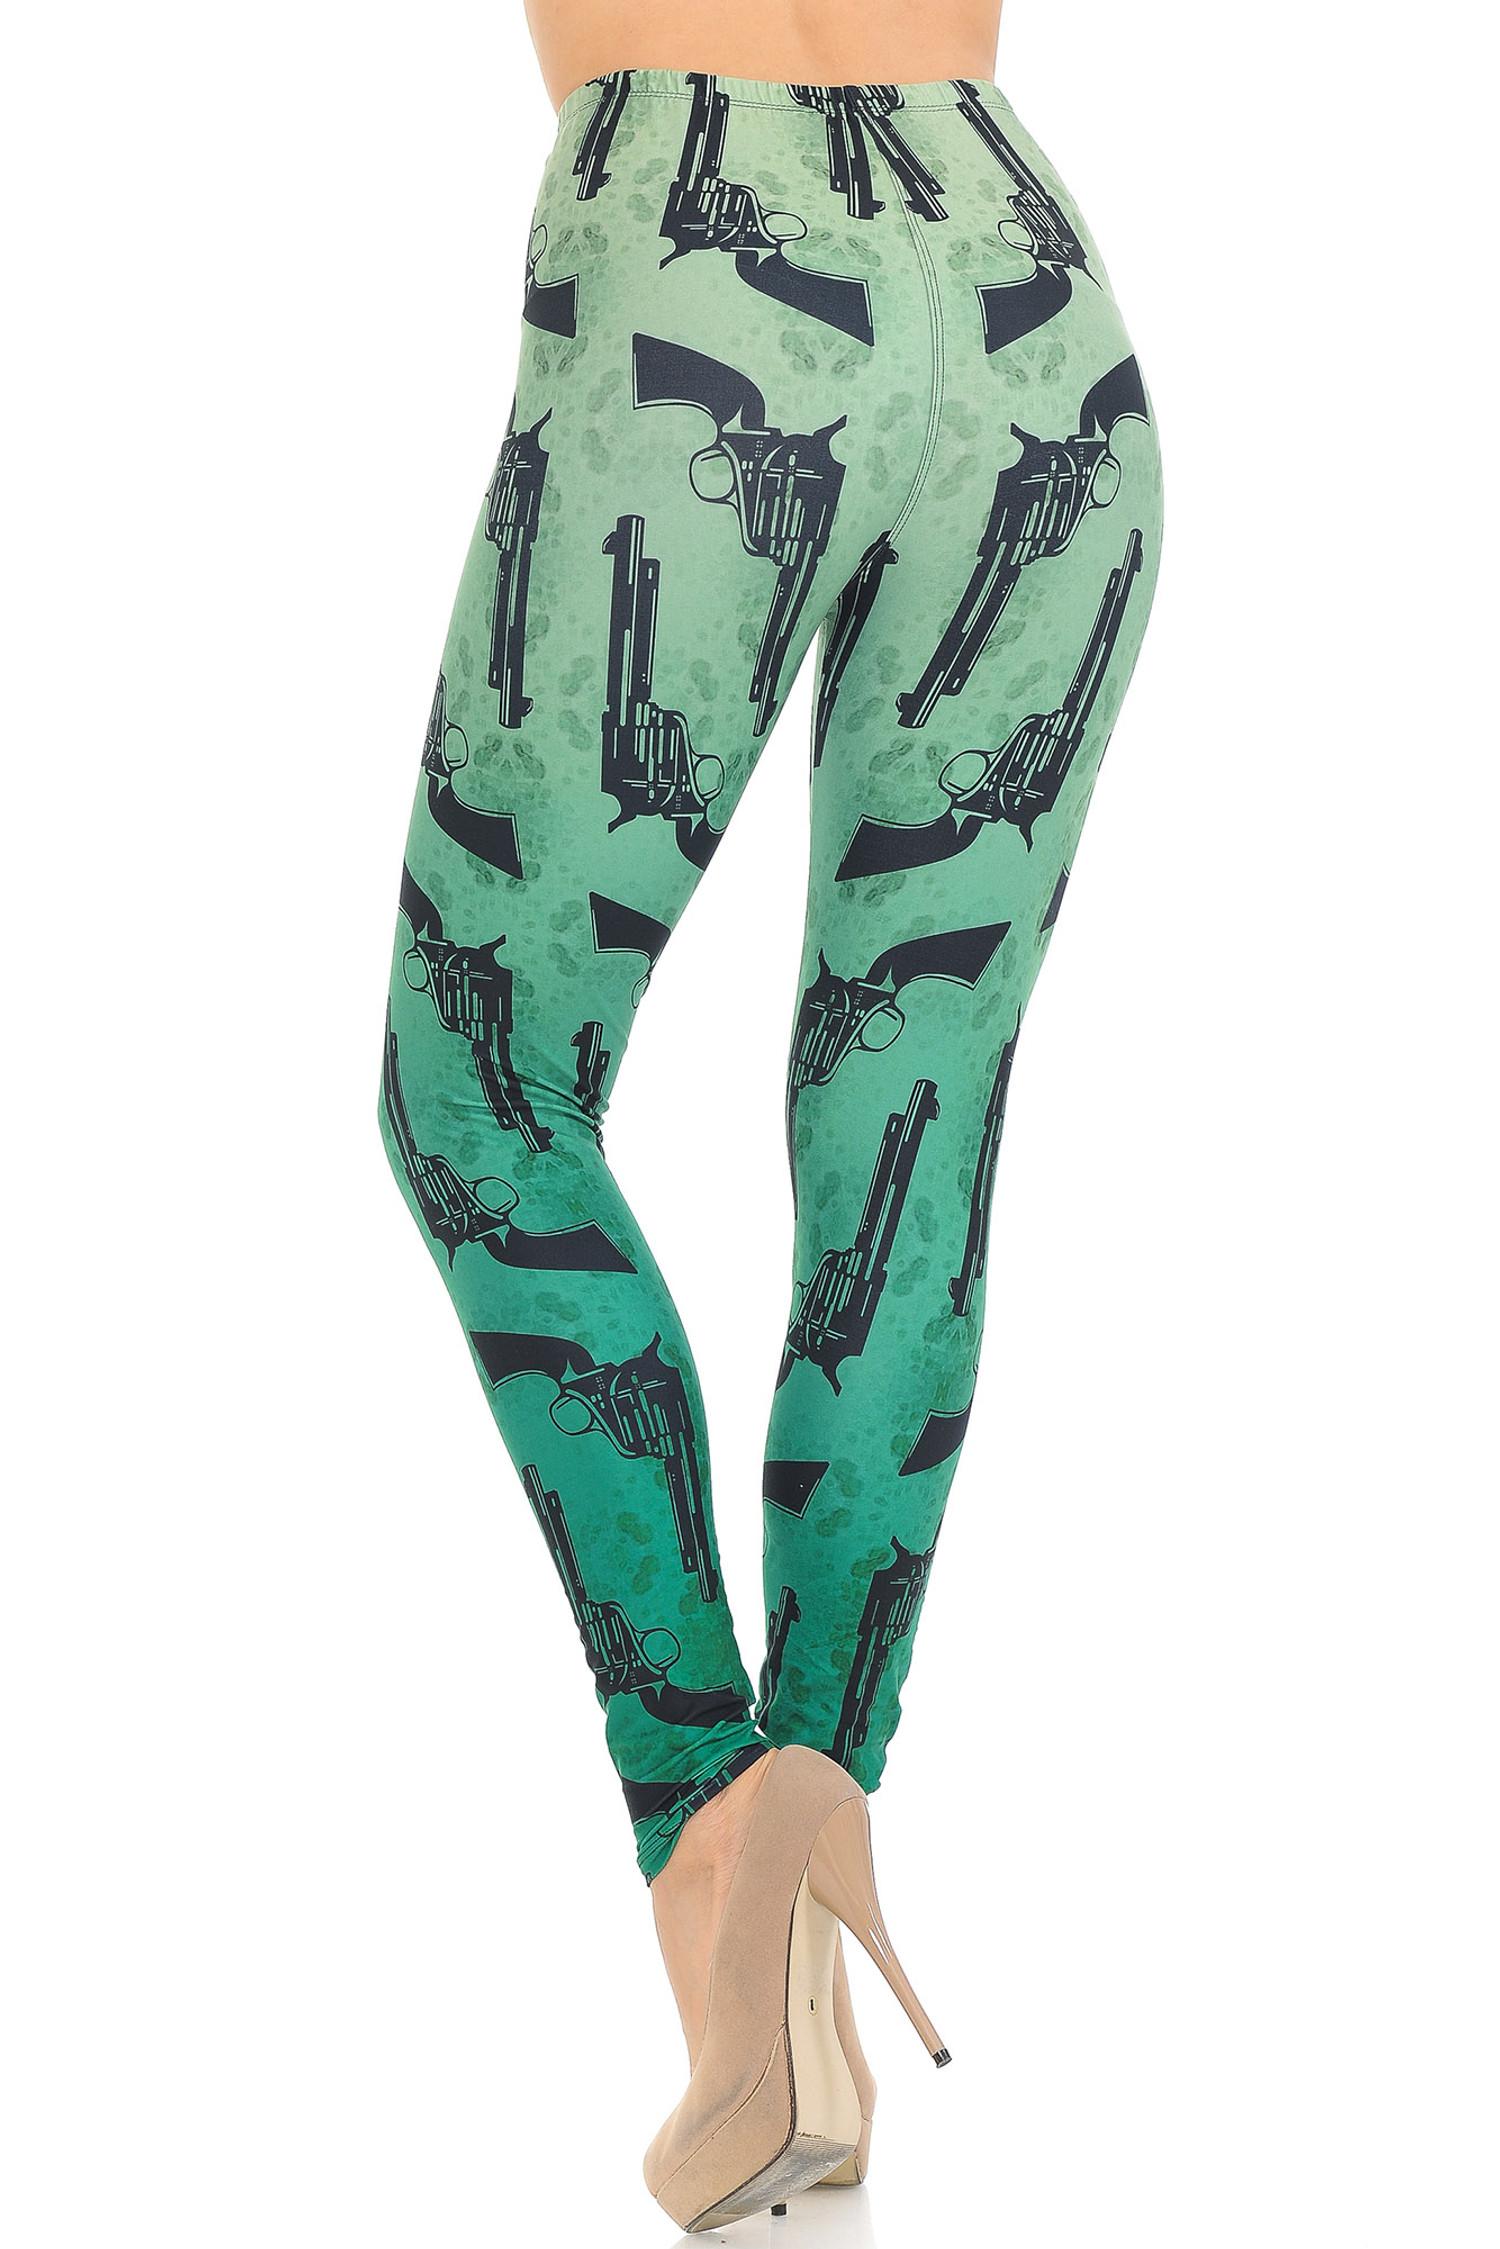 Creamy Soft Ombre Green Guns Leggings